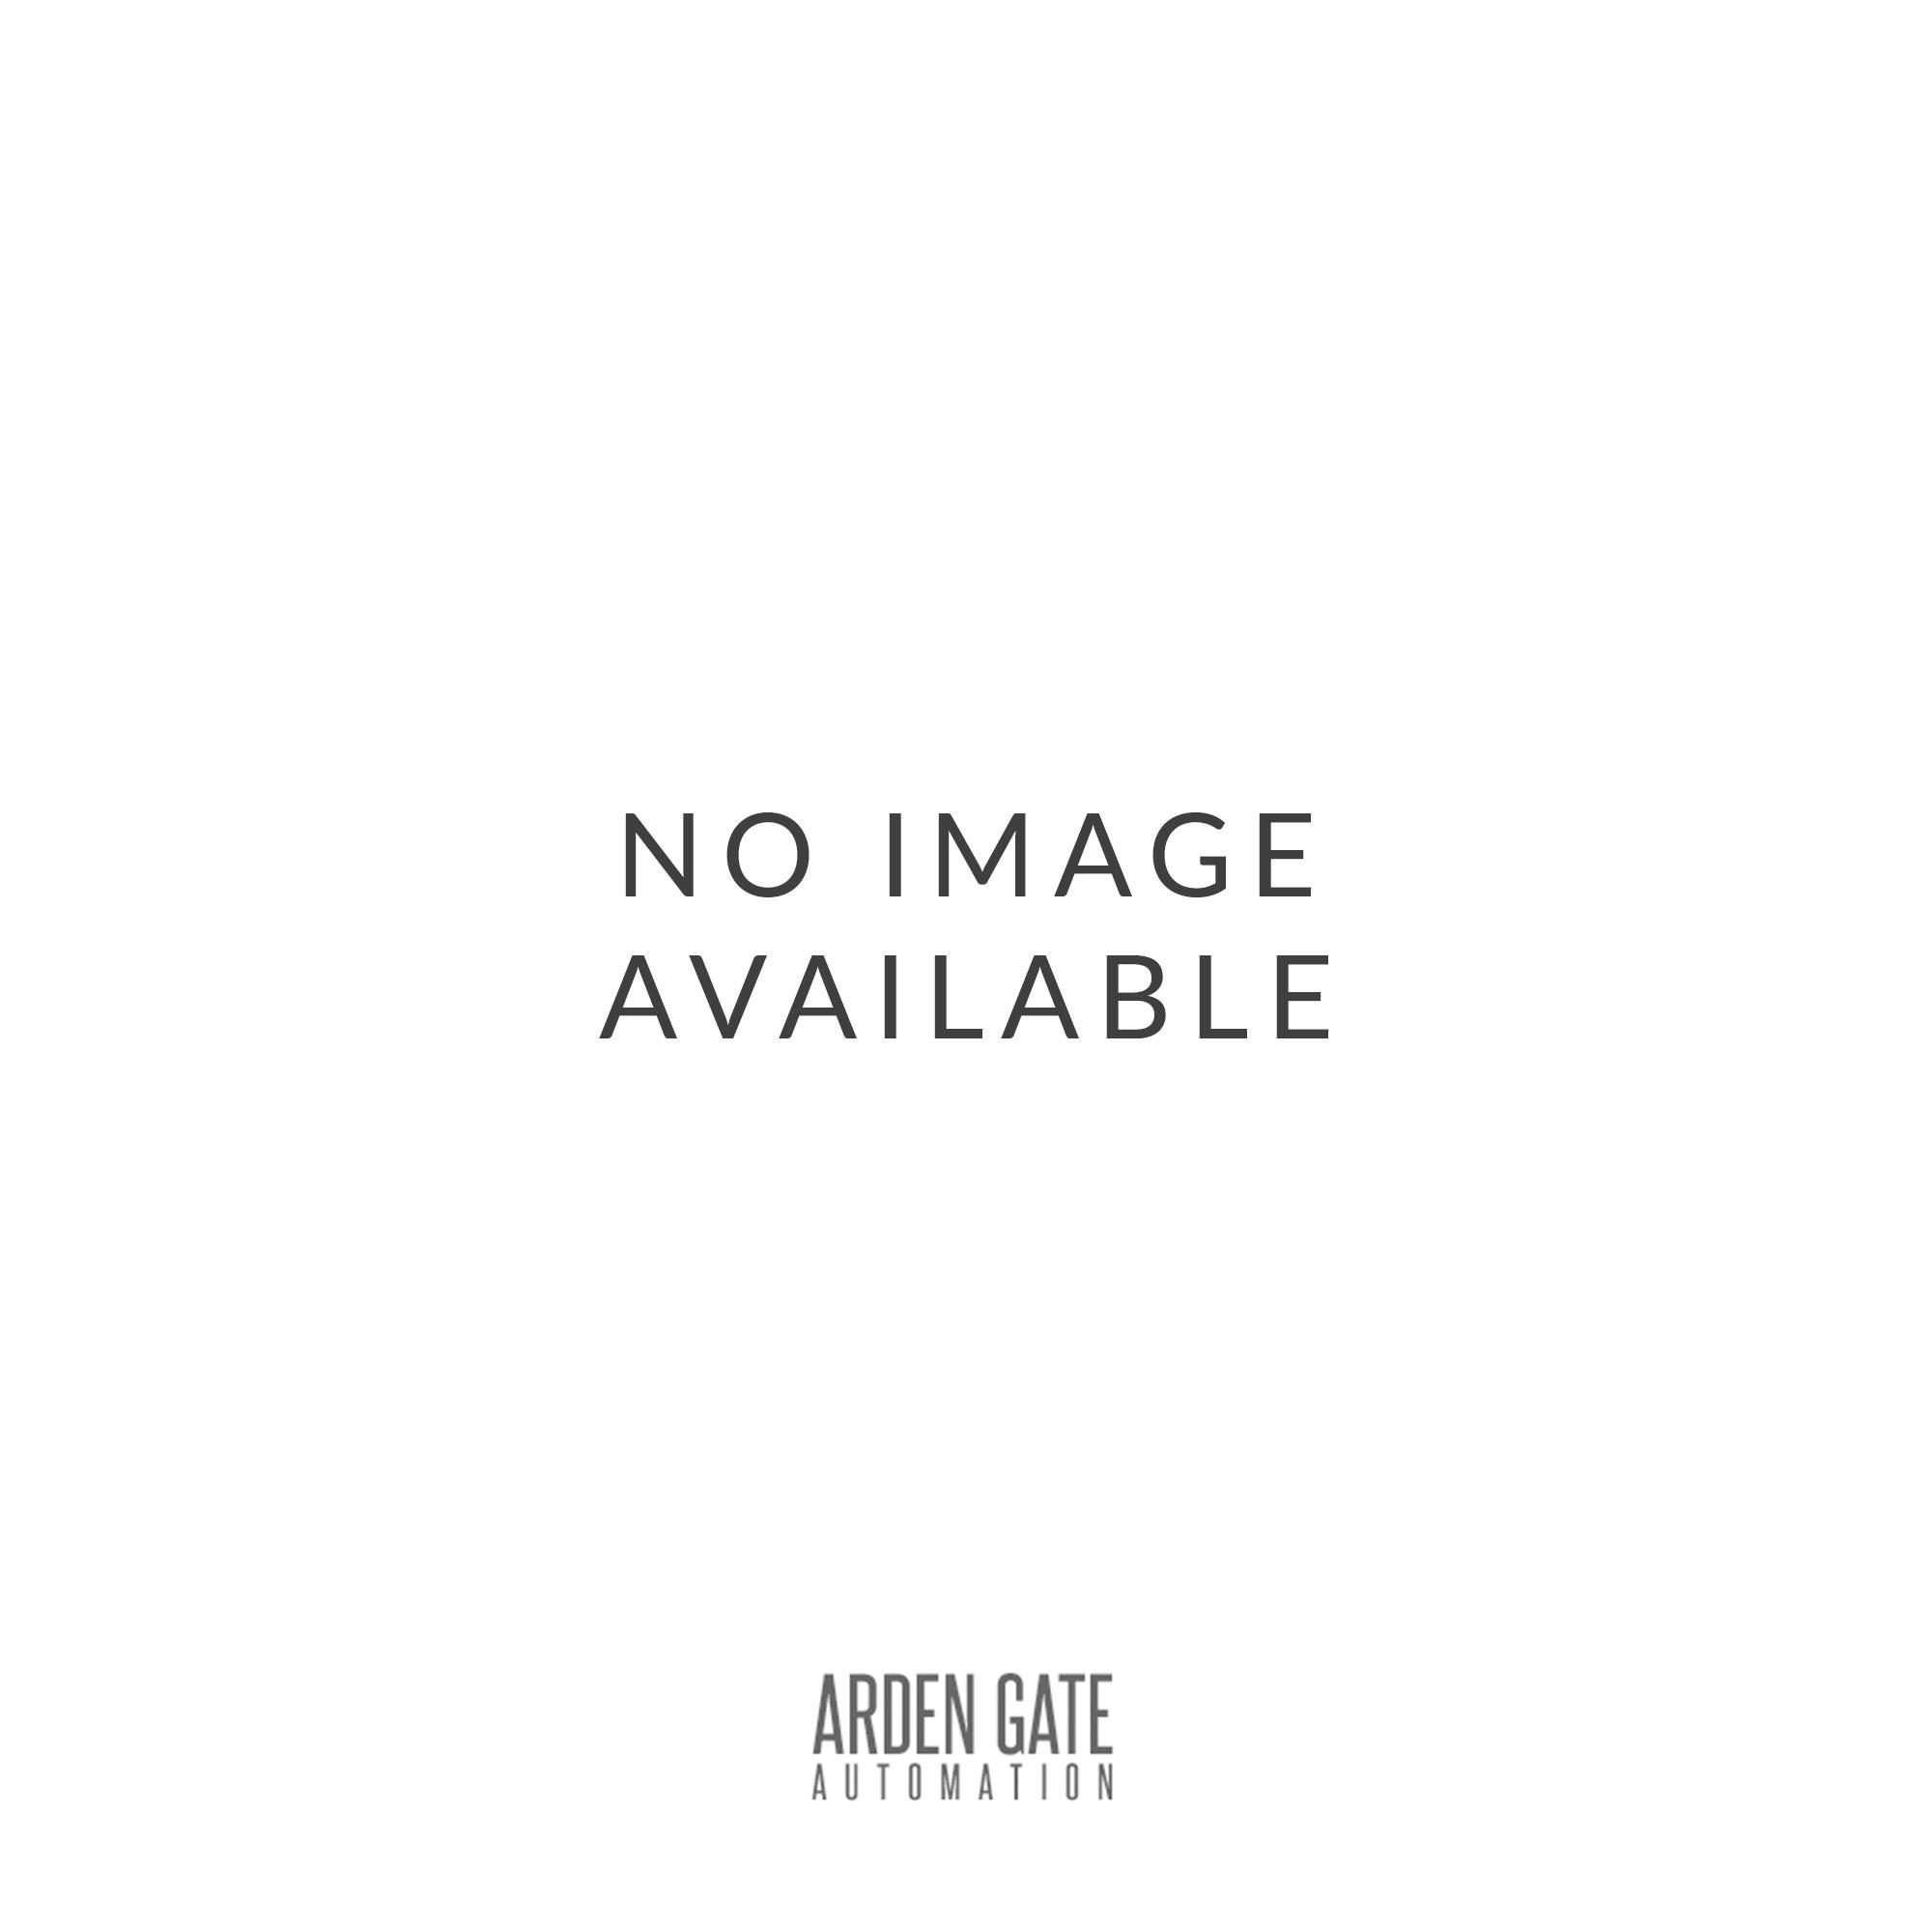 PRED2-WIFI-IMP Imperial (Pedestal Mount) wifi intercom - New Wifi Predator Mark 2